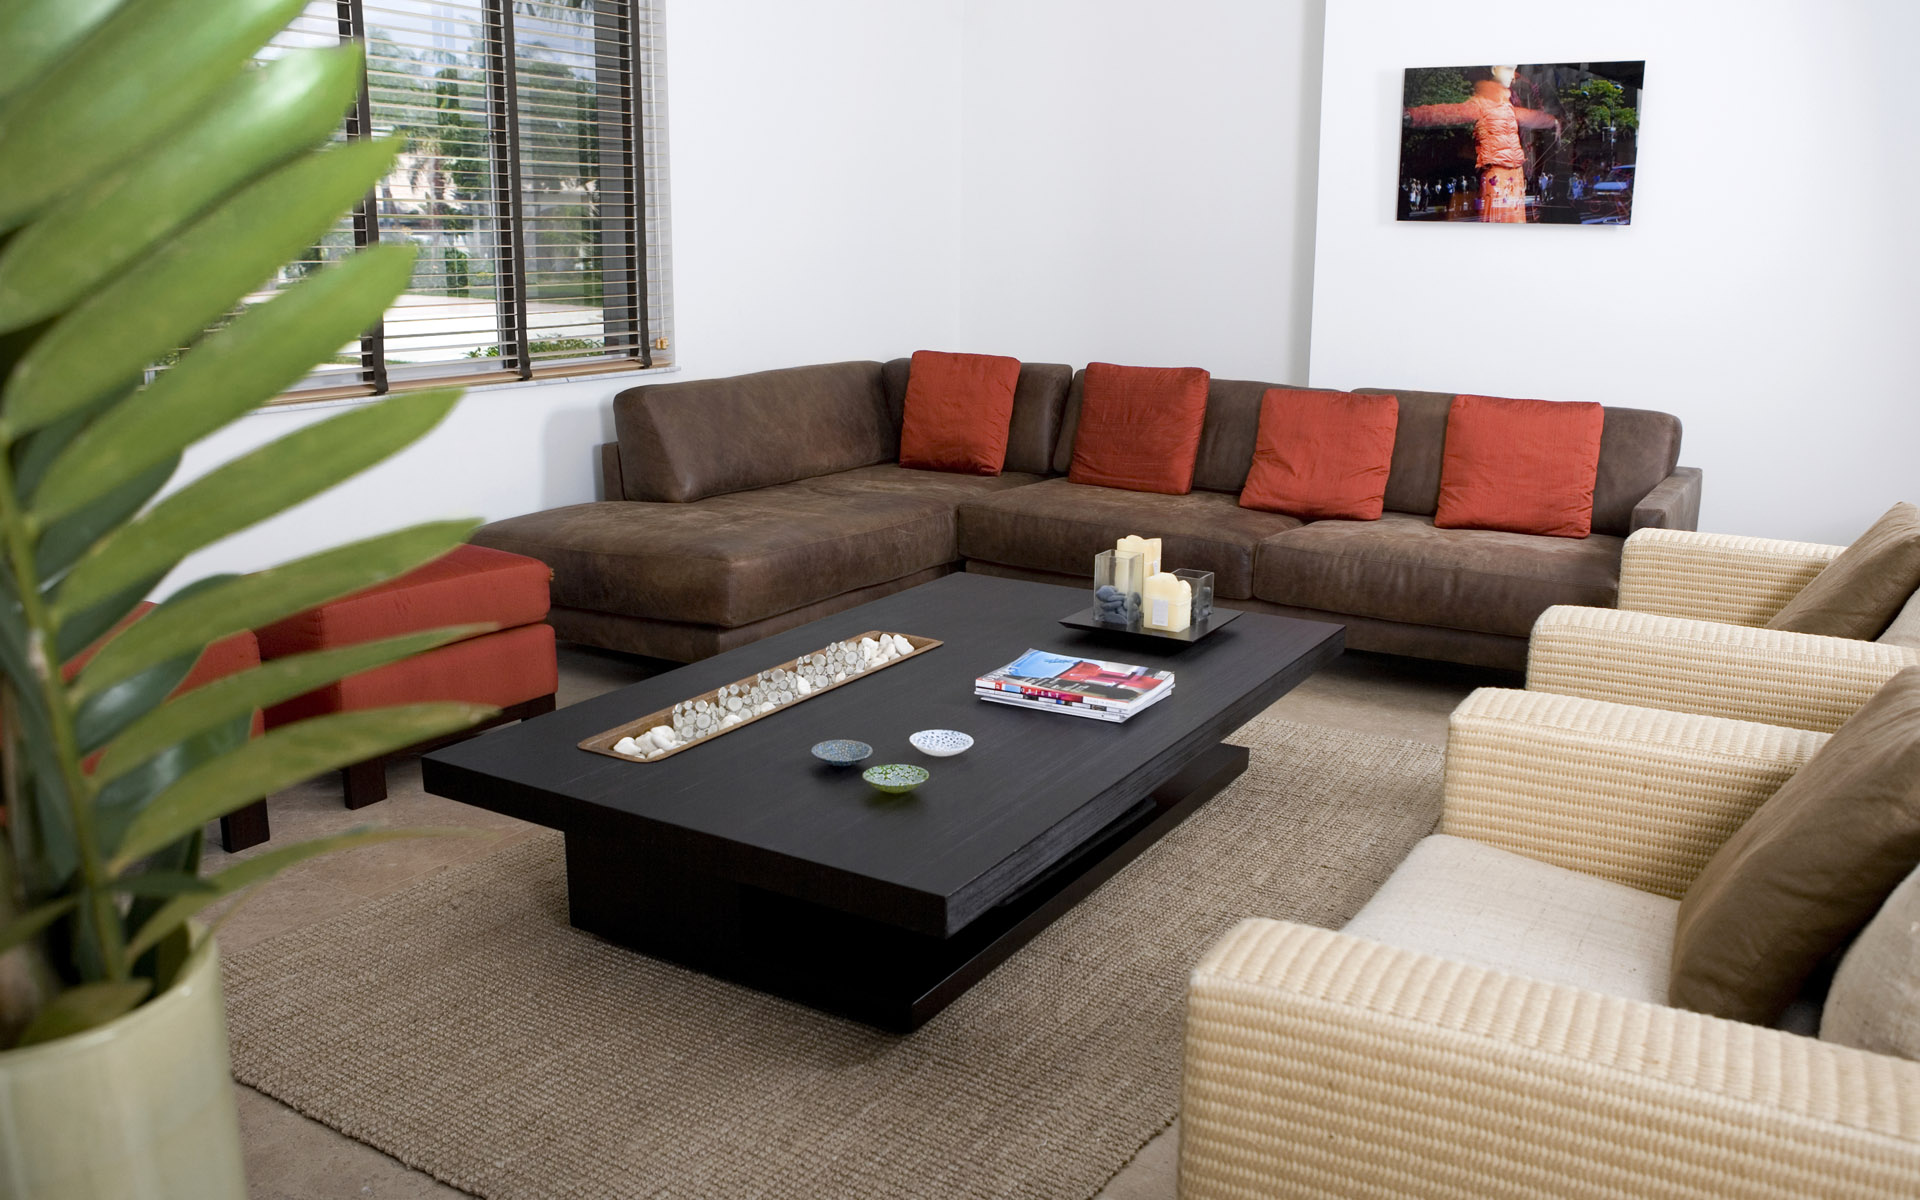 Admirable Modern Sitting Room Idea Interior Design Ideas Andrewgaddart Wooden Chair Designs For Living Room Andrewgaddartcom